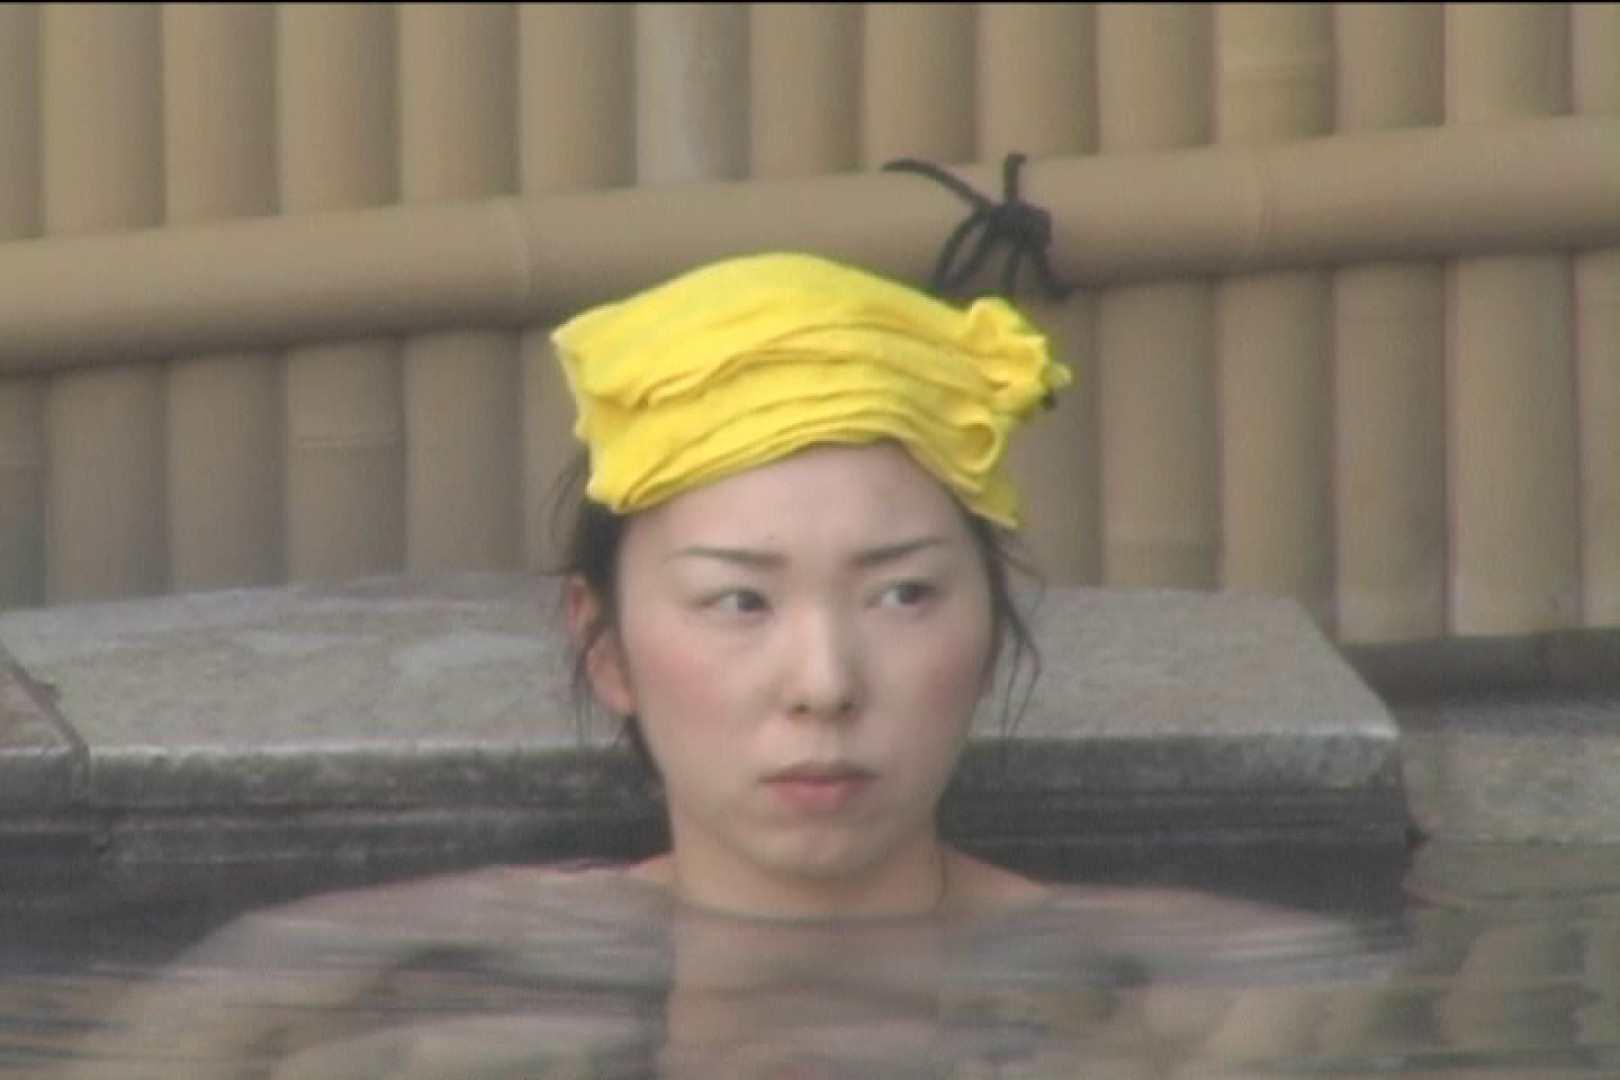 Aquaな露天風呂Vol.529 盗撮映像  51Pix 32